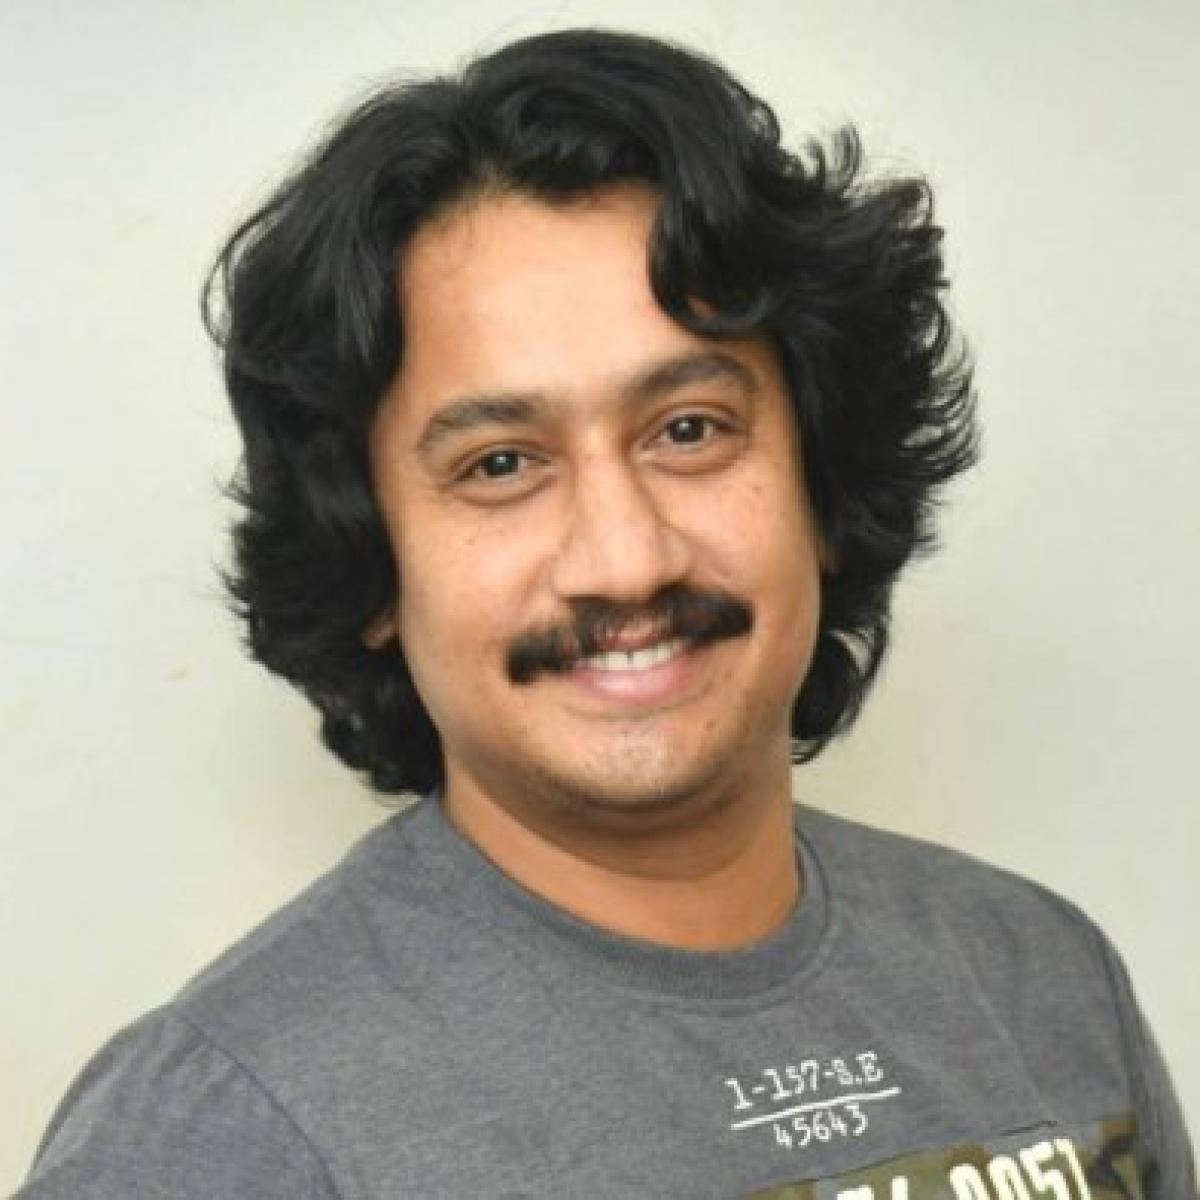 Kannada actor Sanchari Vijay, 38, dies after tragic road accident, Kichcha Sudeepa confirms